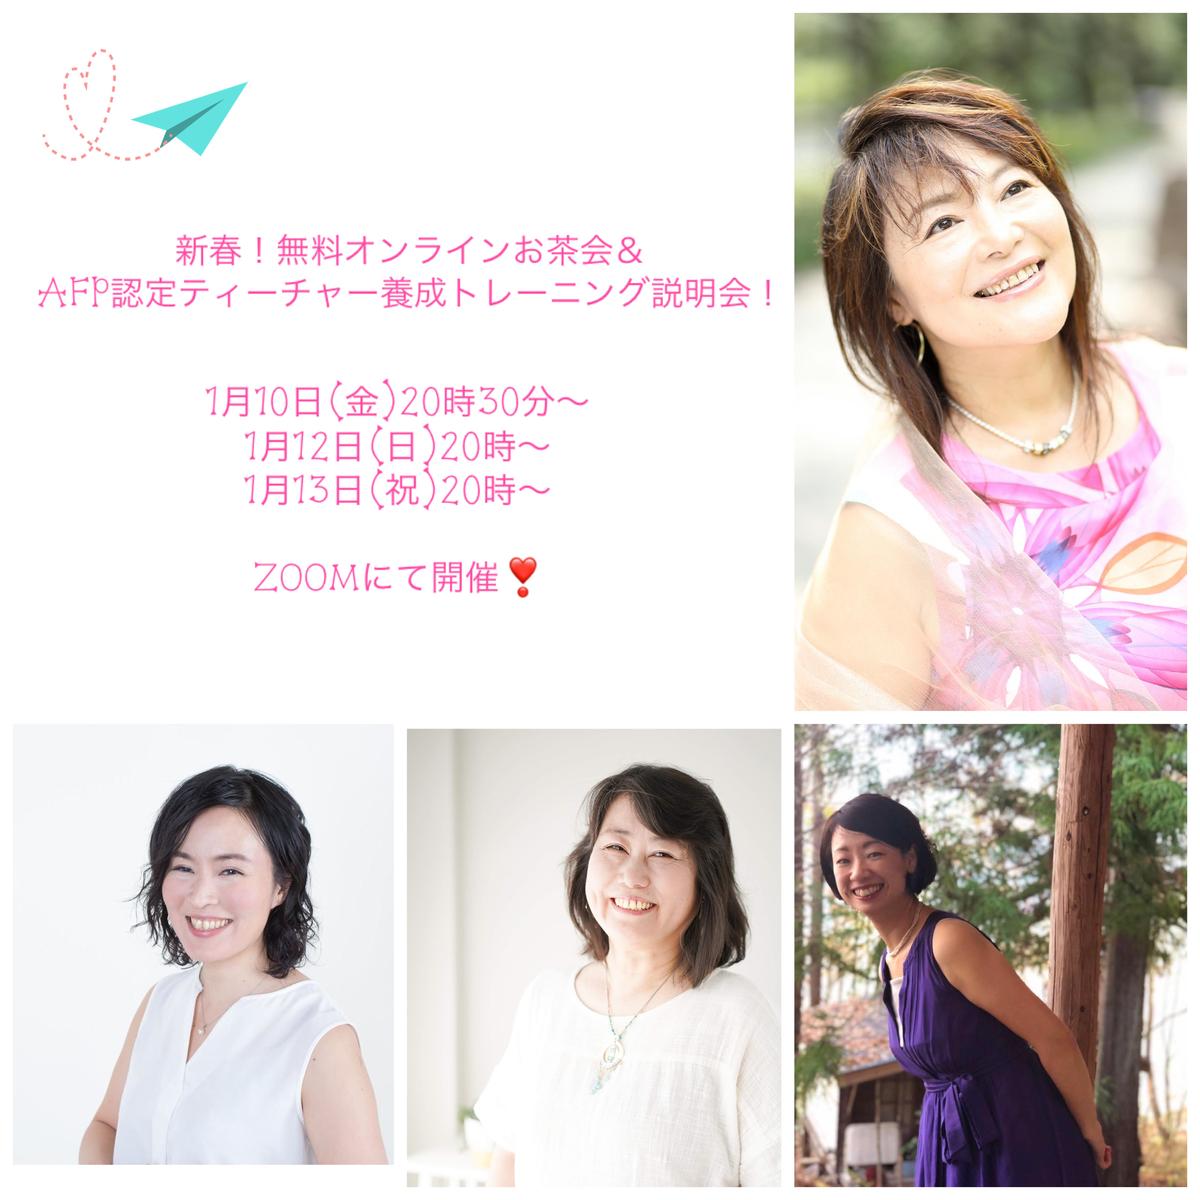 f:id:AFPJapan:20200110150727j:plain